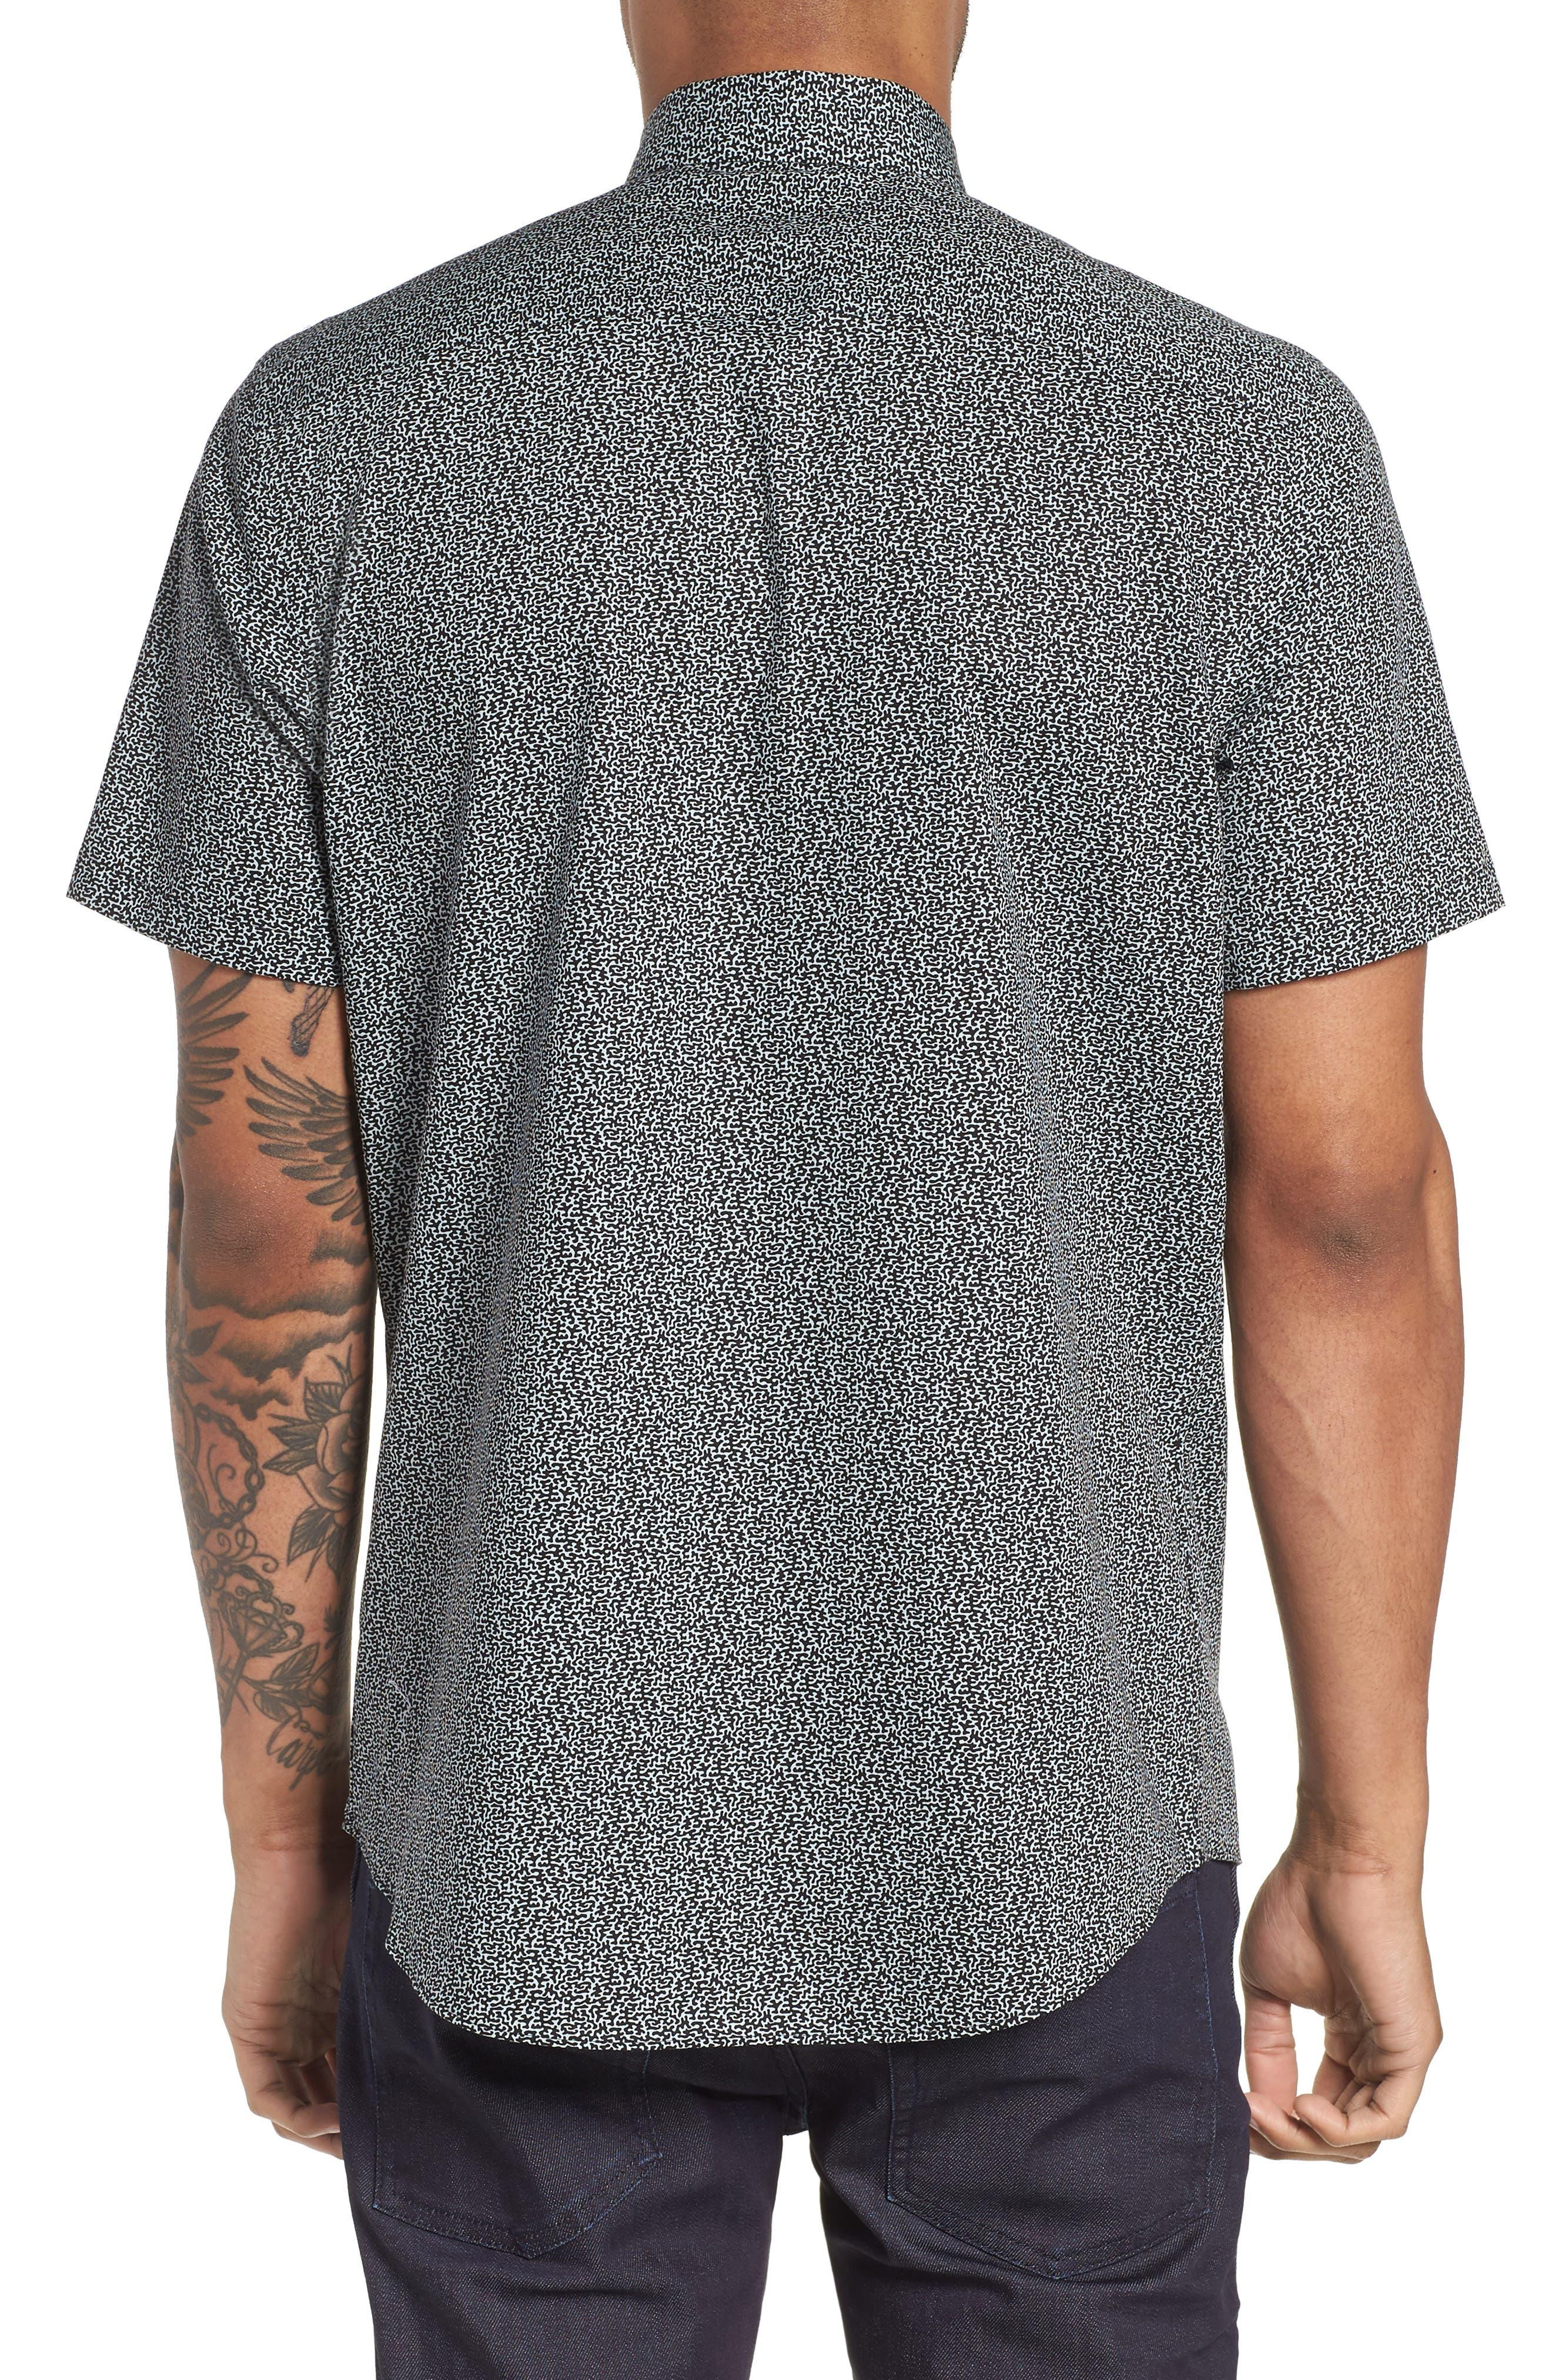 Trim Fit Print Sport Shirt,                             Alternate thumbnail 3, color,                             Blue Cloud Black Abstract